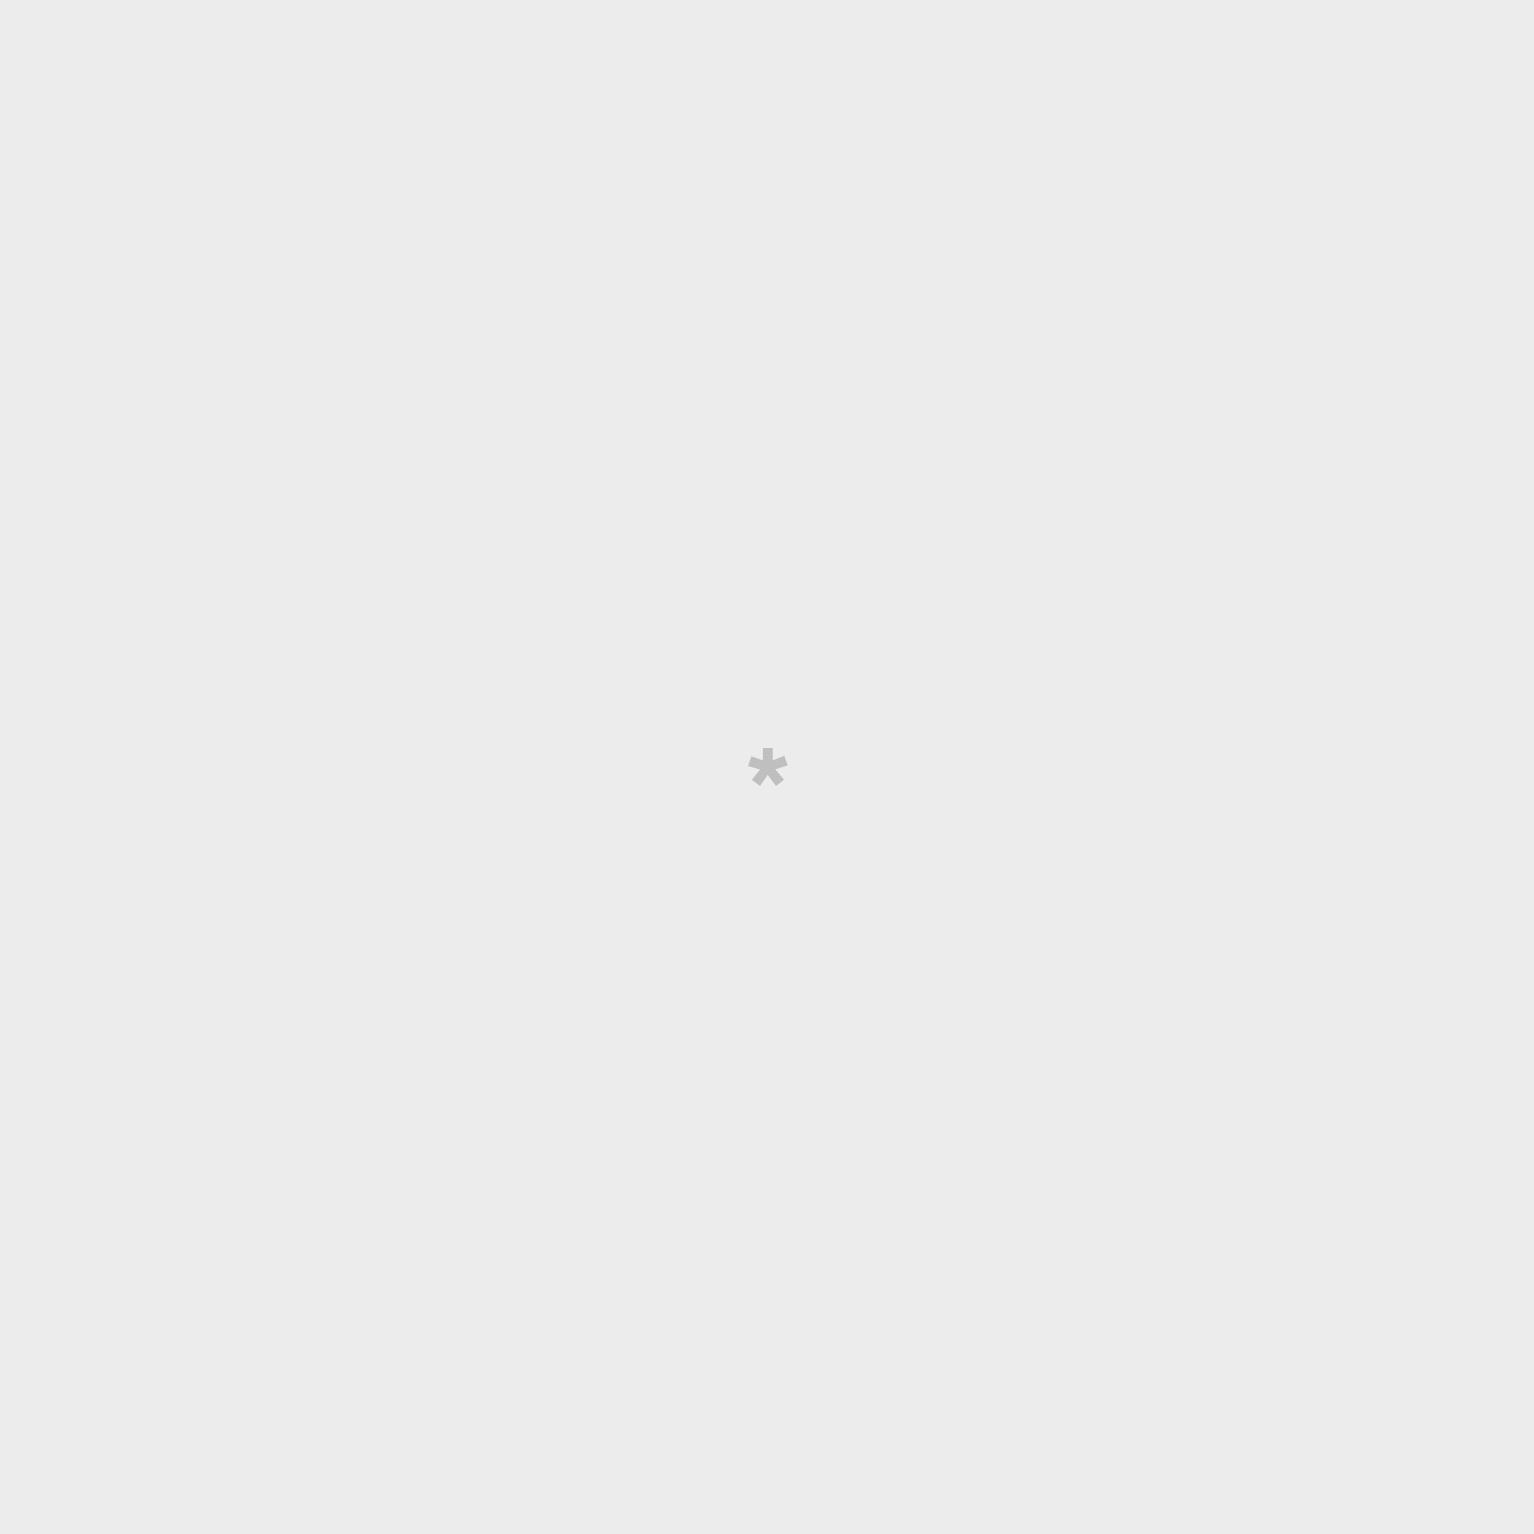 Bote de clips de papel - Aguacate